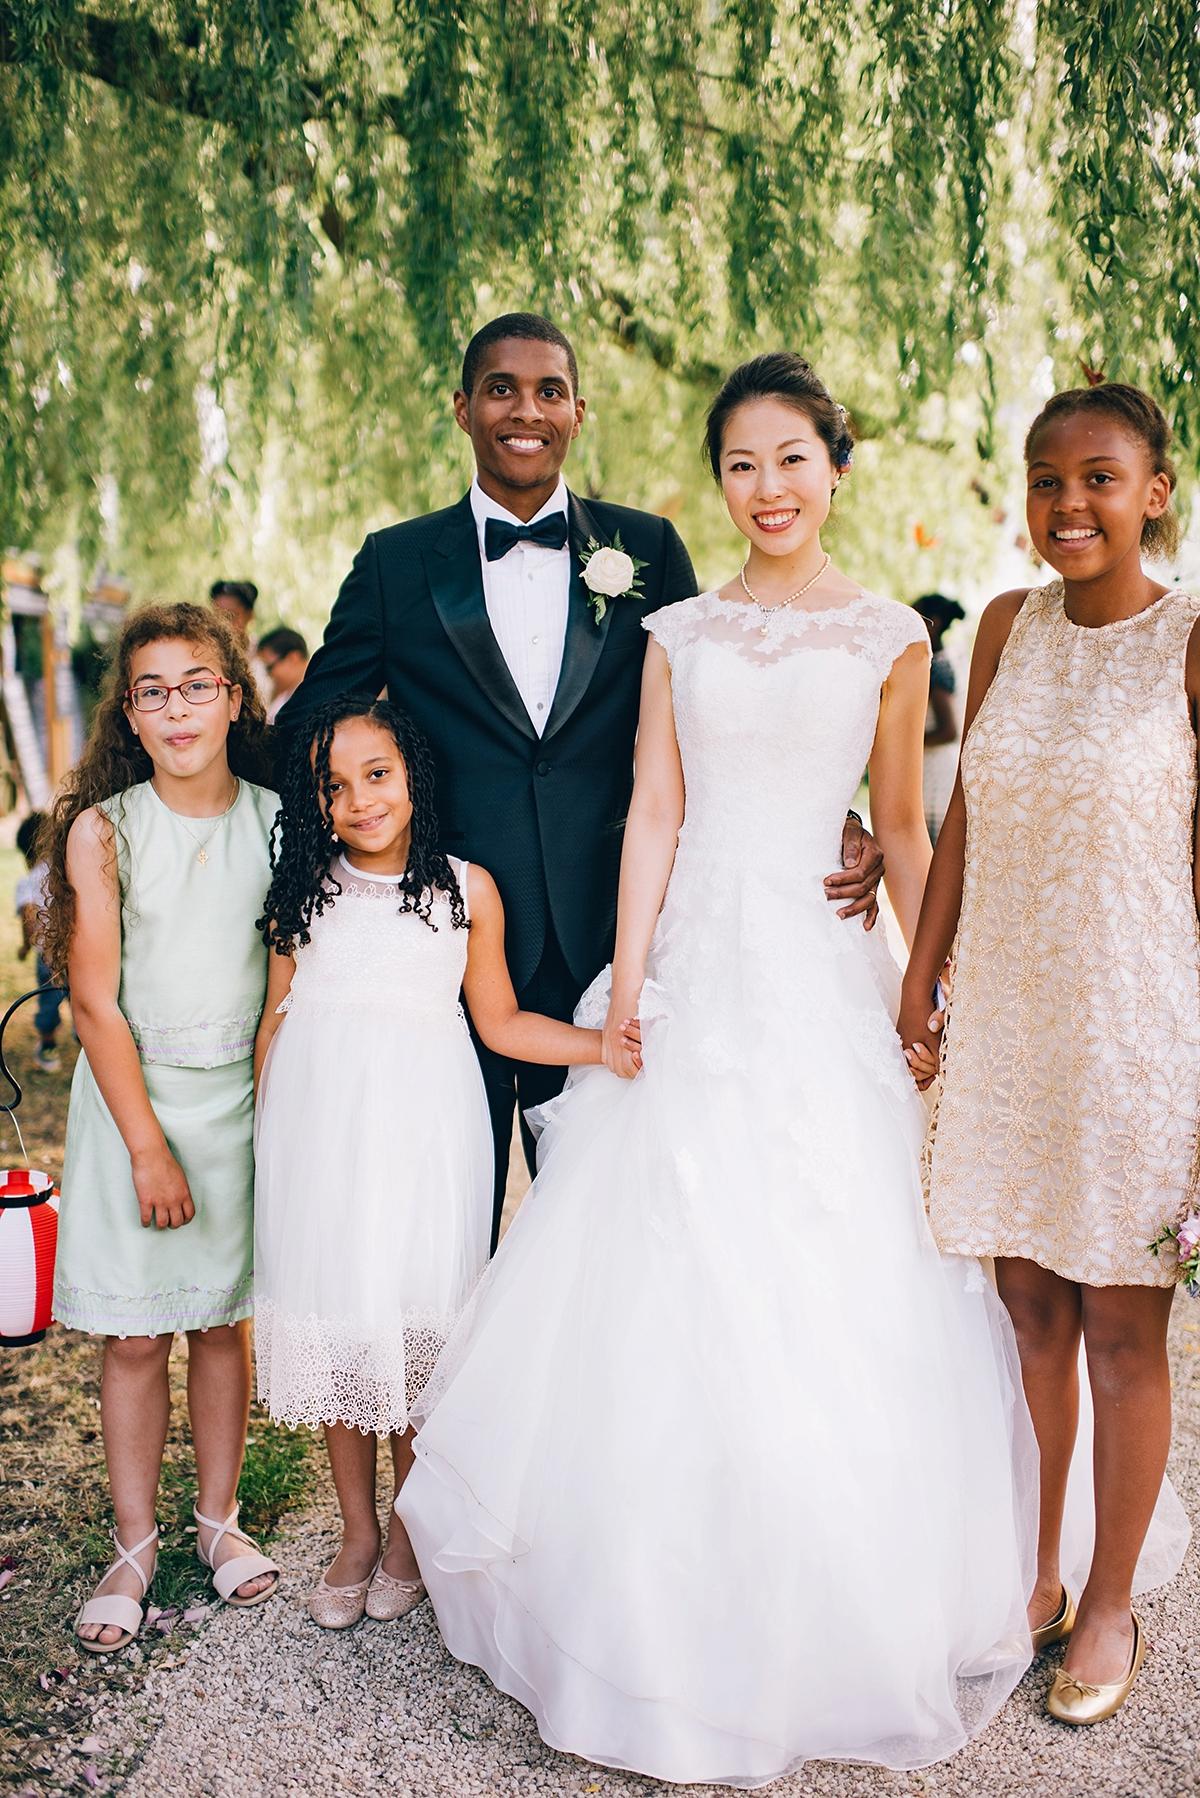 https://www.lovemydress.net/wp-content/uploads/2017/09/japanese-british-fusion-wedding-35.jpg